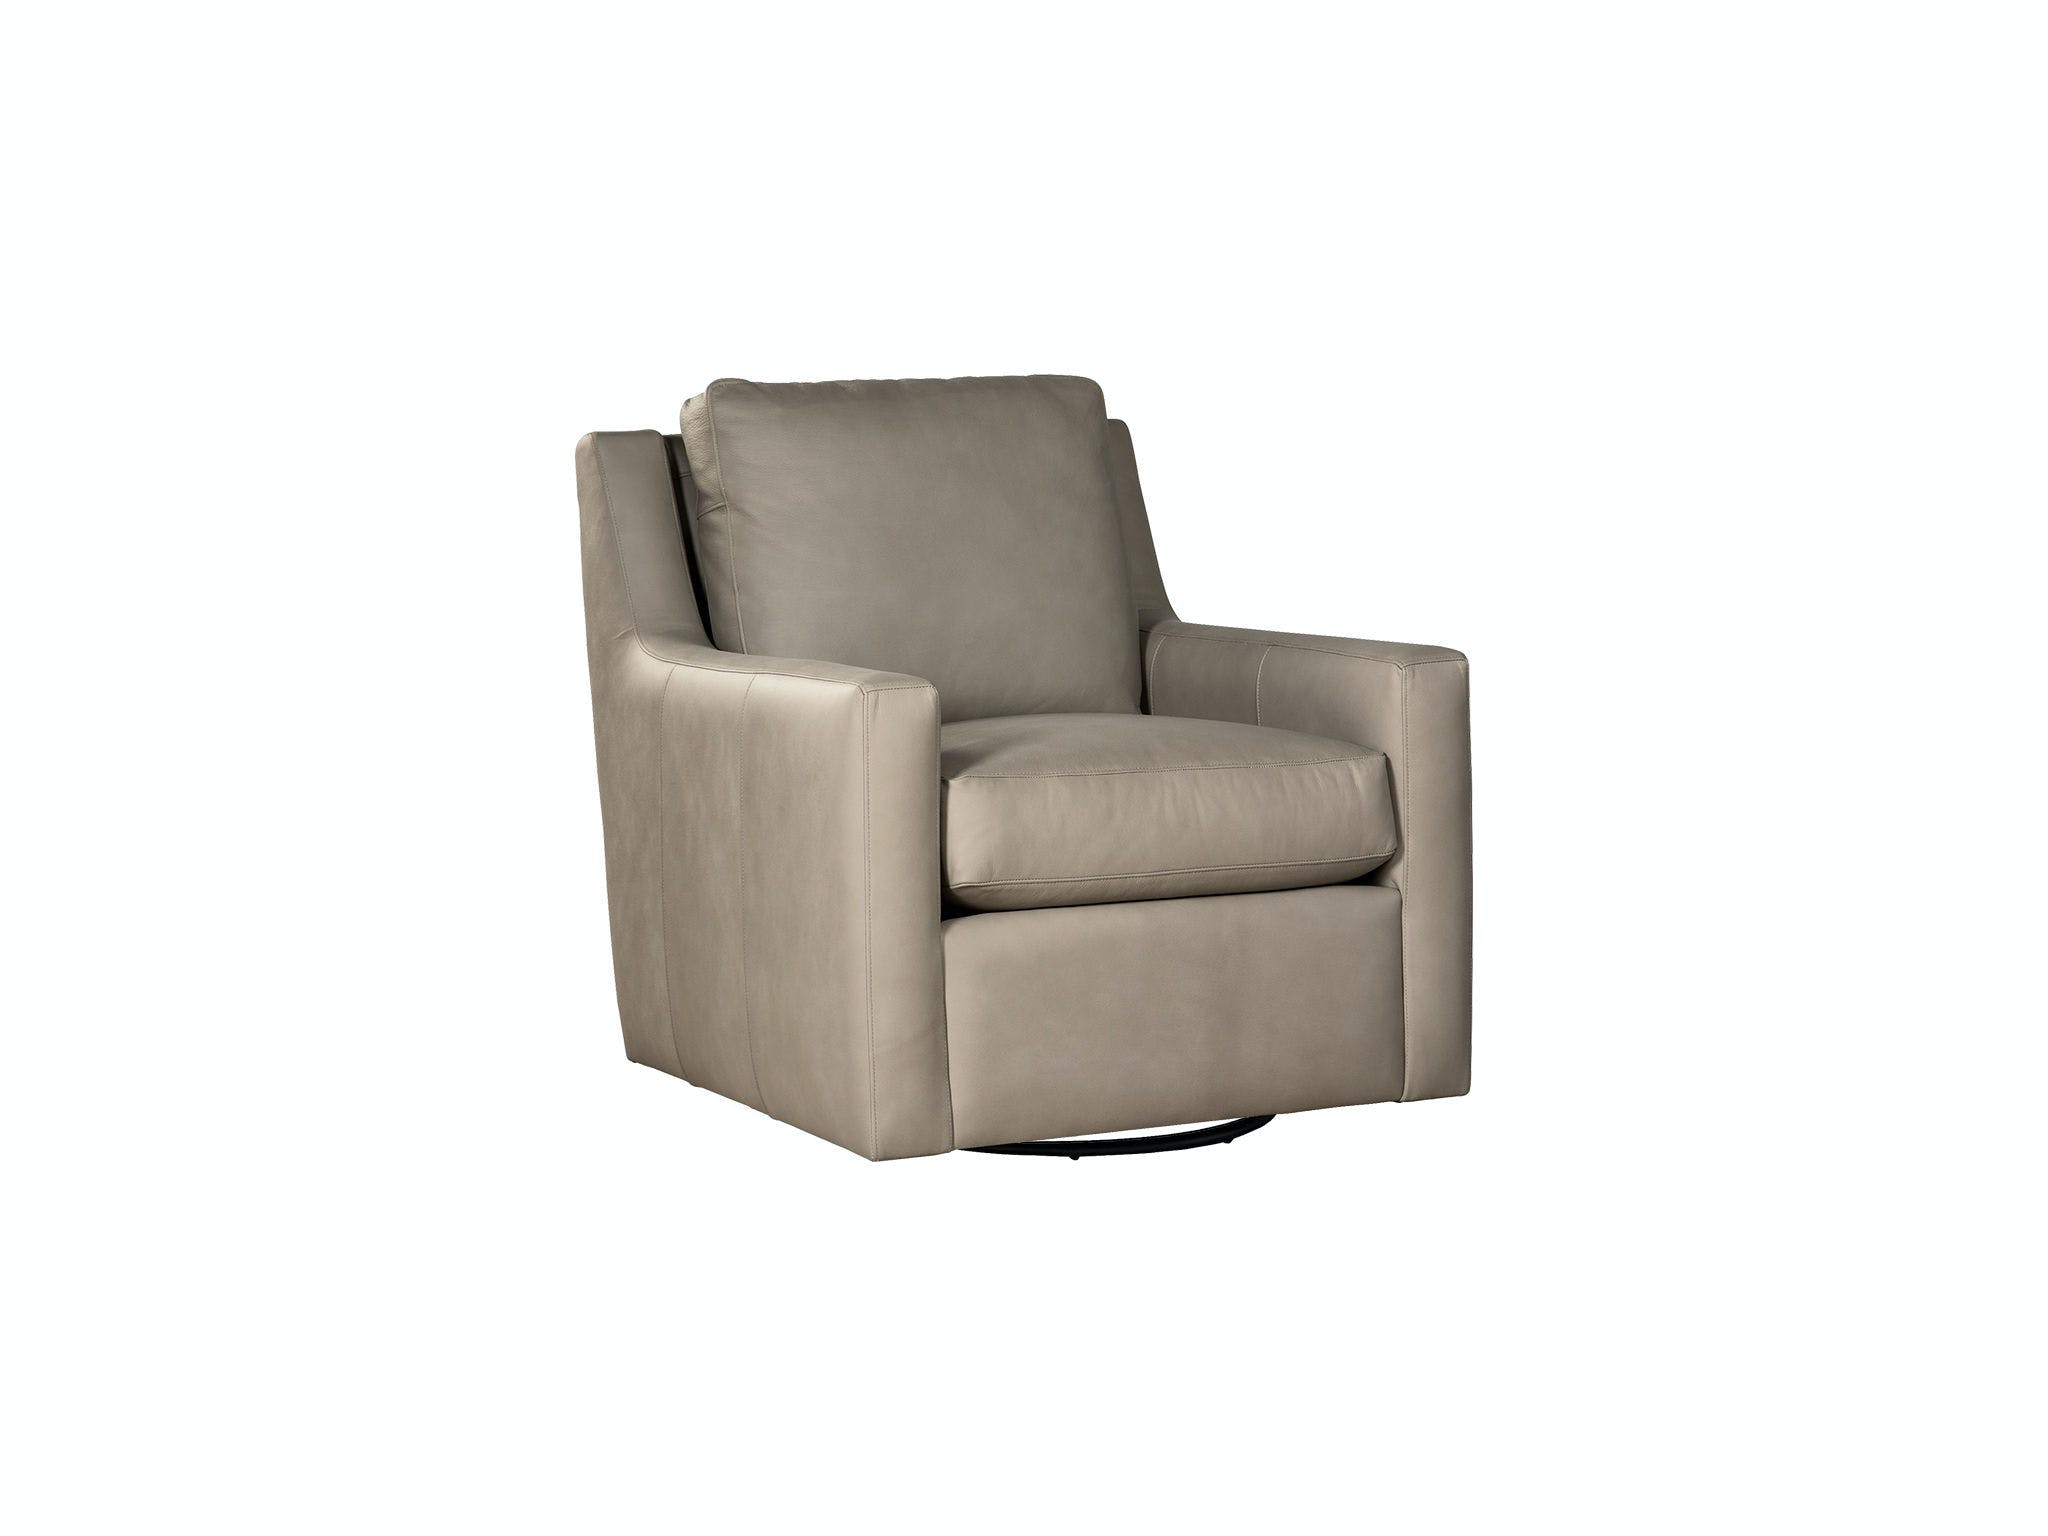 Cozy Life Living Room Swivel Glider L072510bdsg Alpena